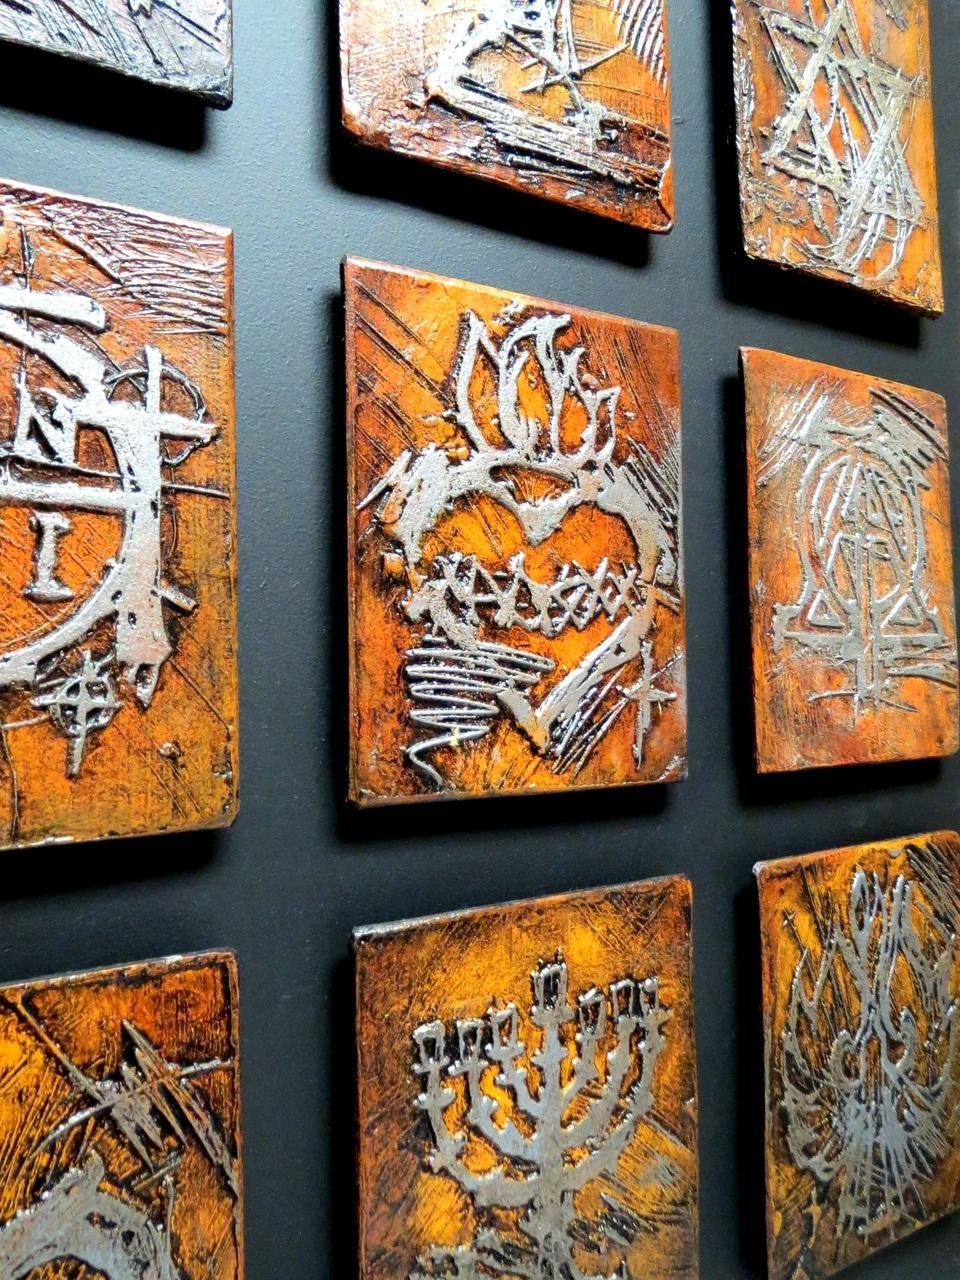 Wall Art Design Ideas: Cruciform Dramatic Contemporary Christian In Christian Framed Wall Art (View 10 of 20)